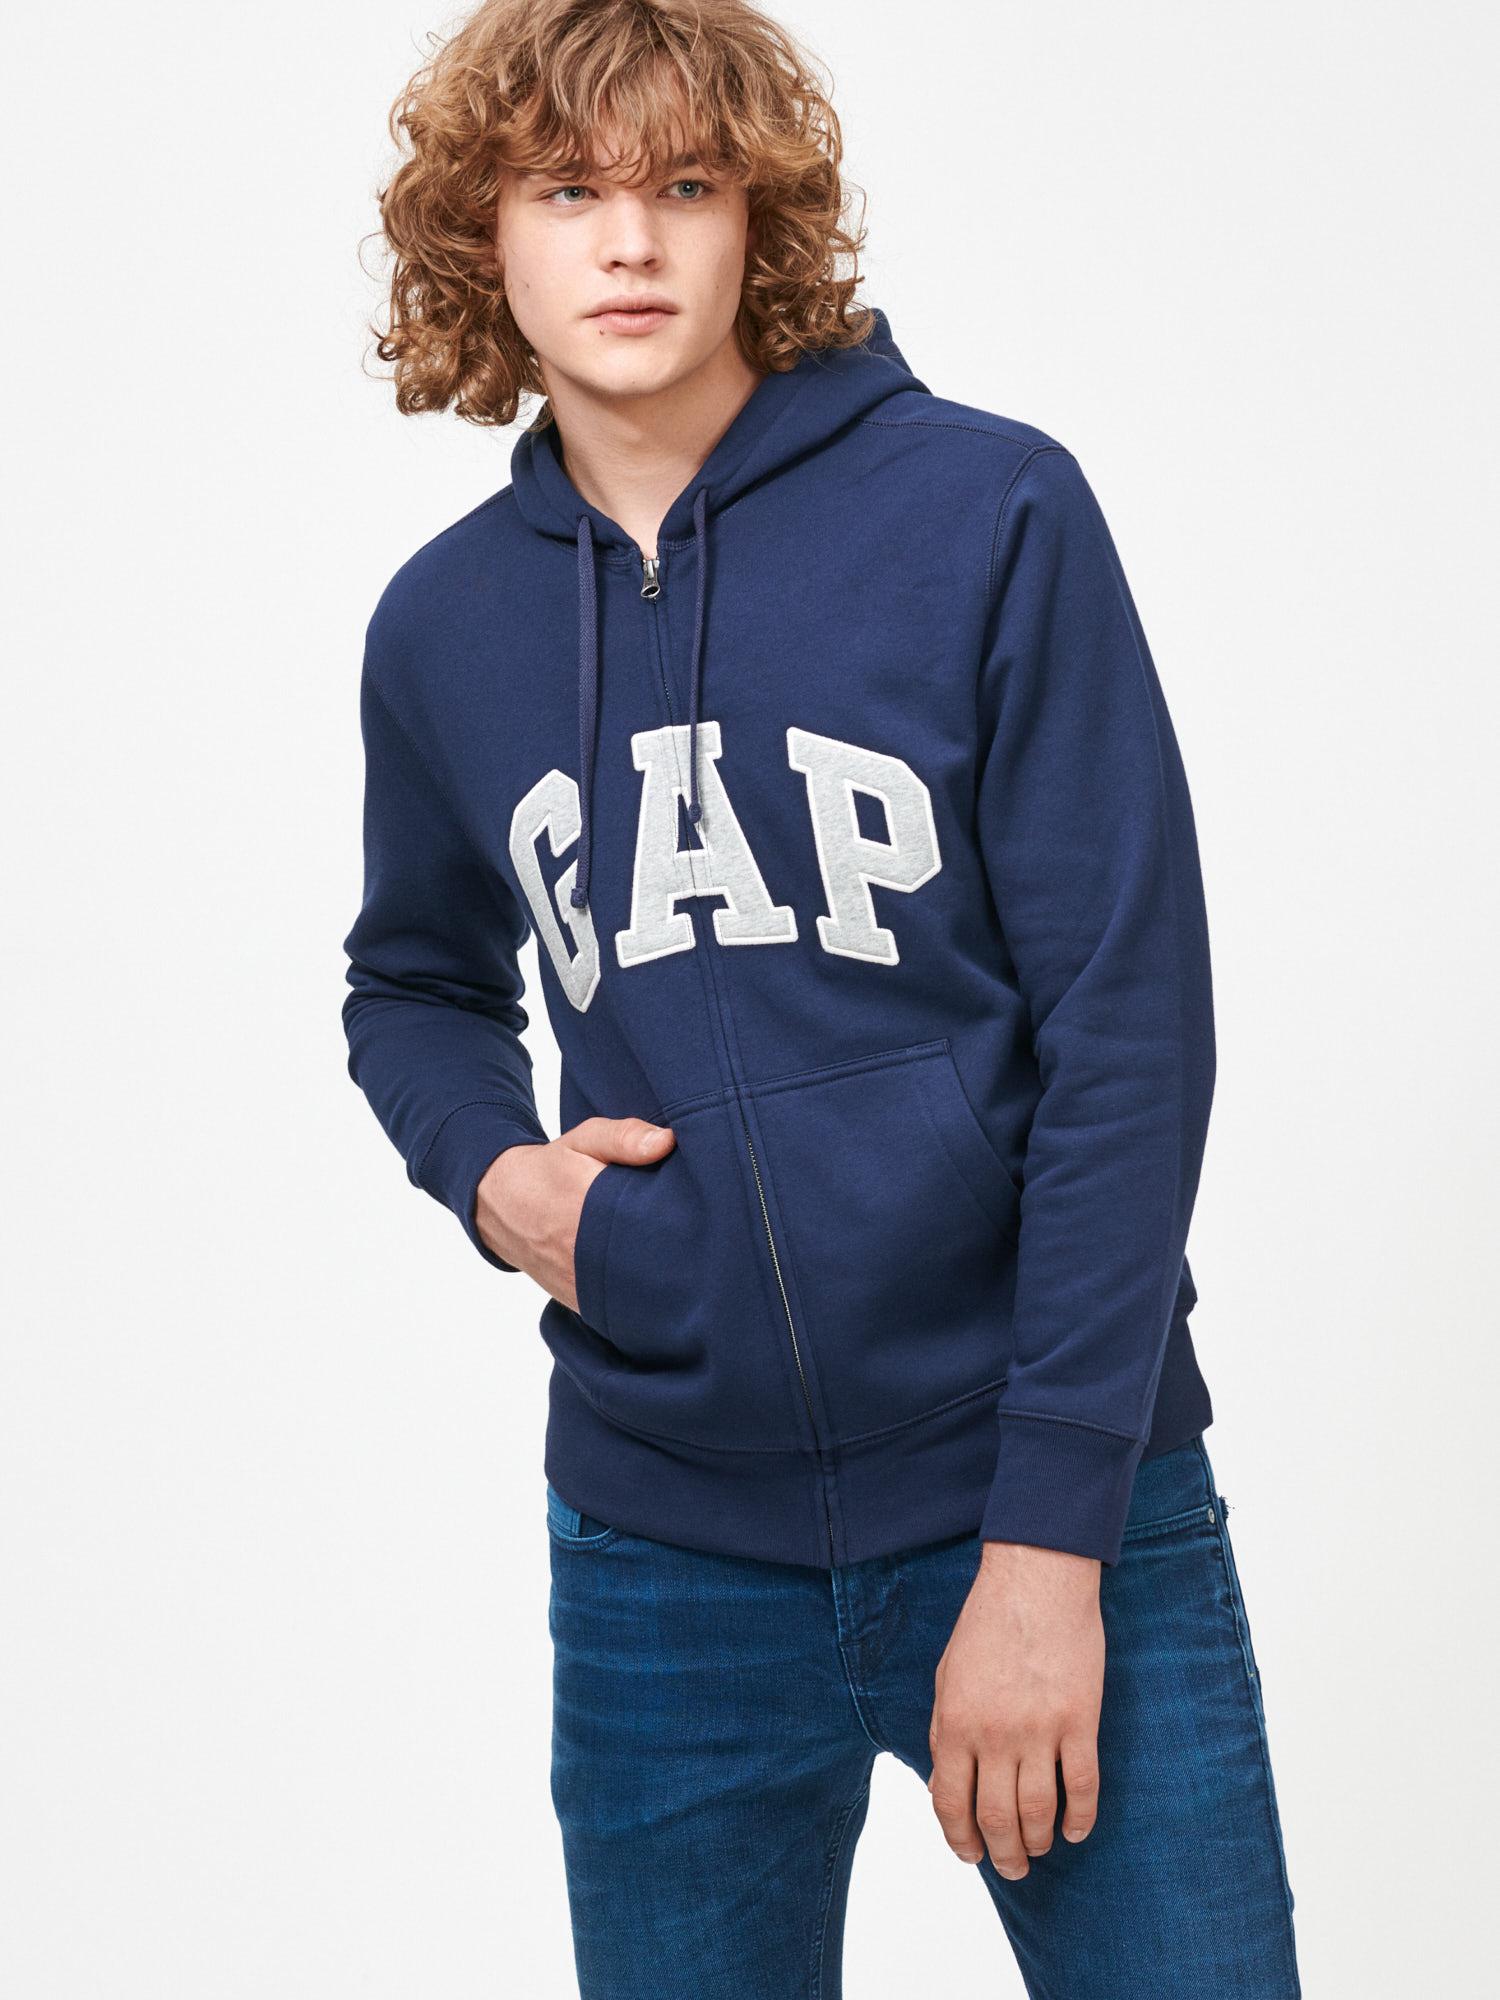 GAP modrá pánska mikina s kapucňou - XL